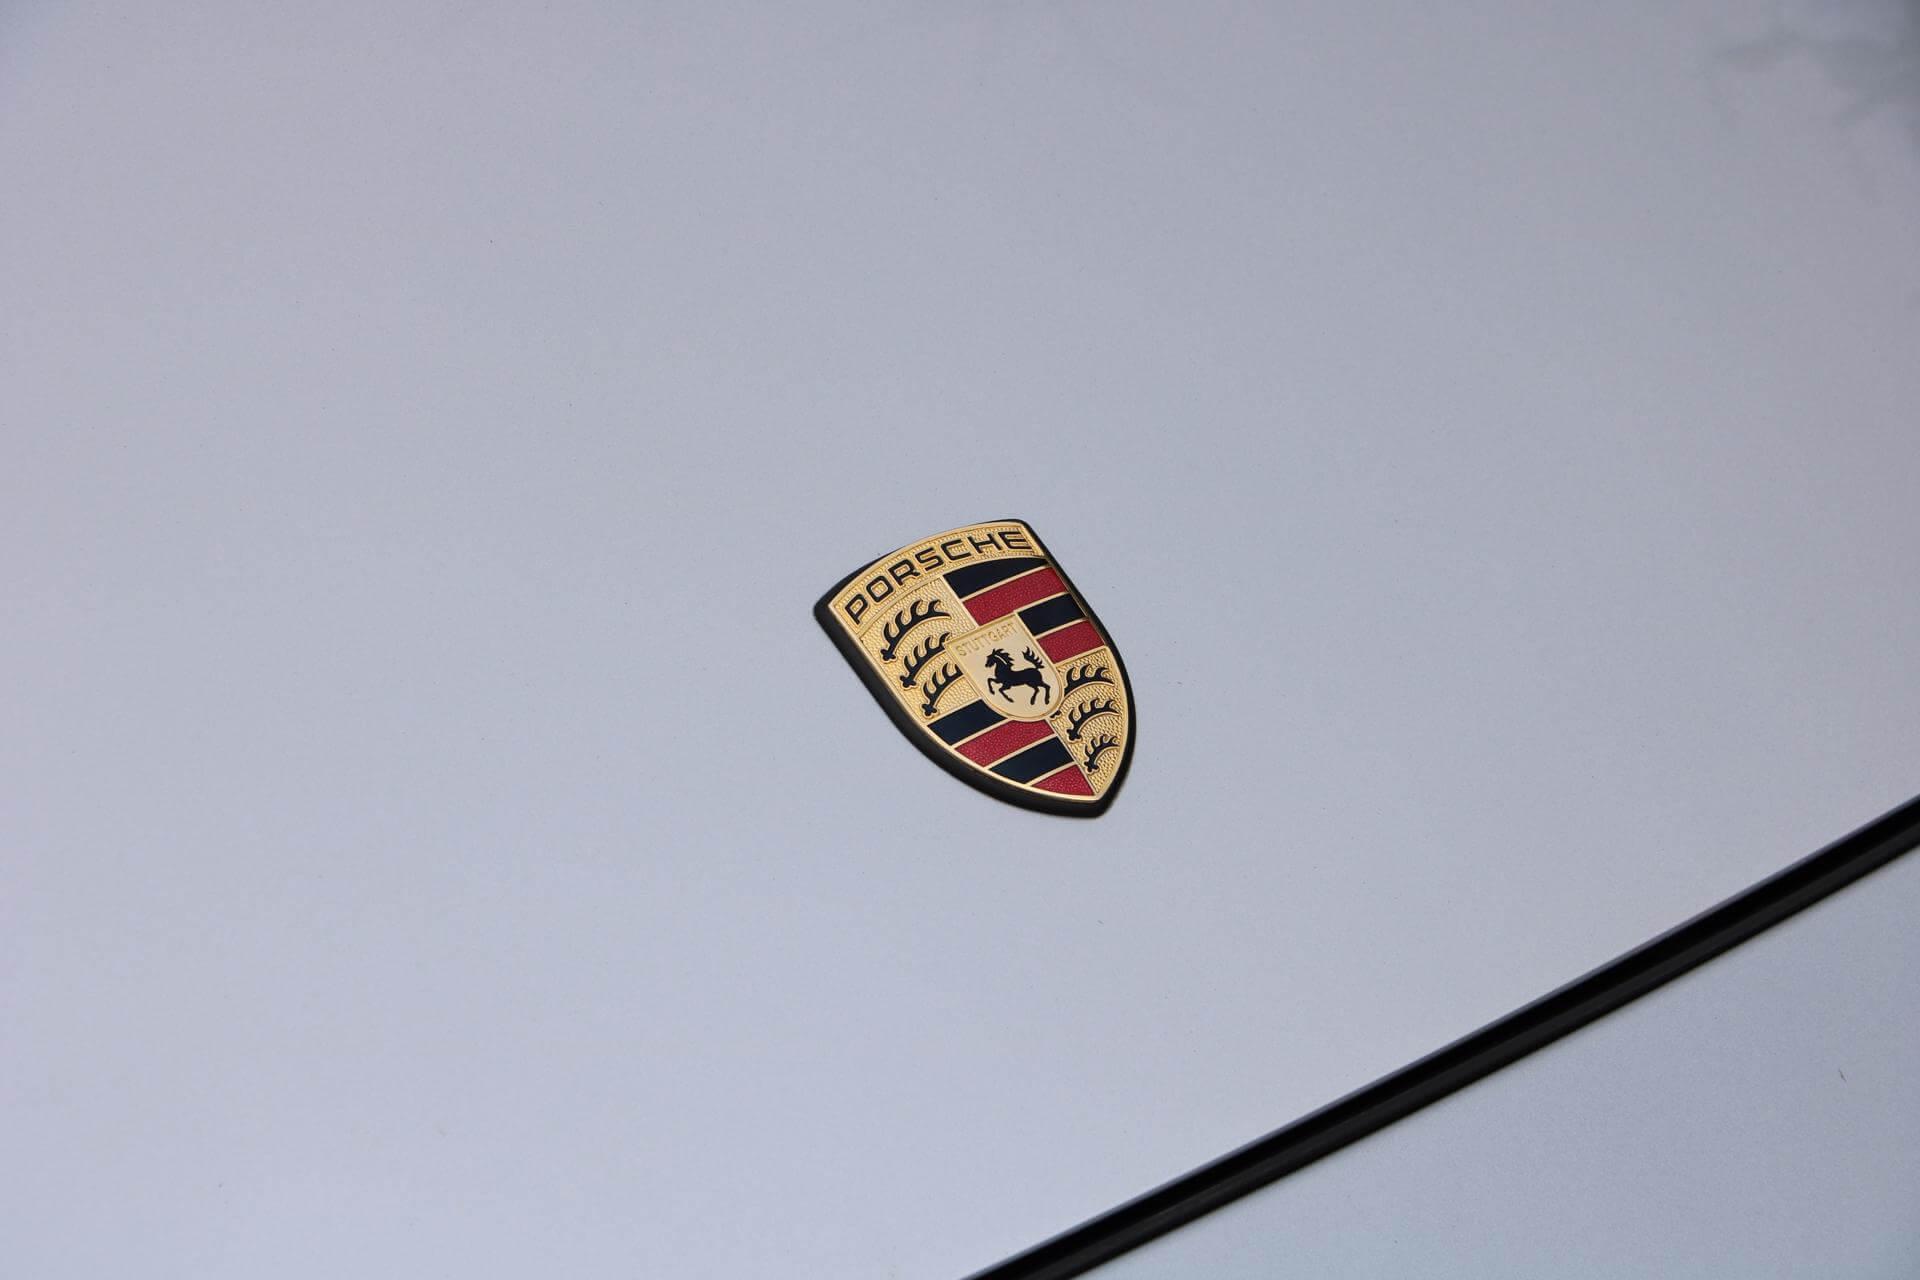 Real Art on Wheels | Porsche 993 Turbo